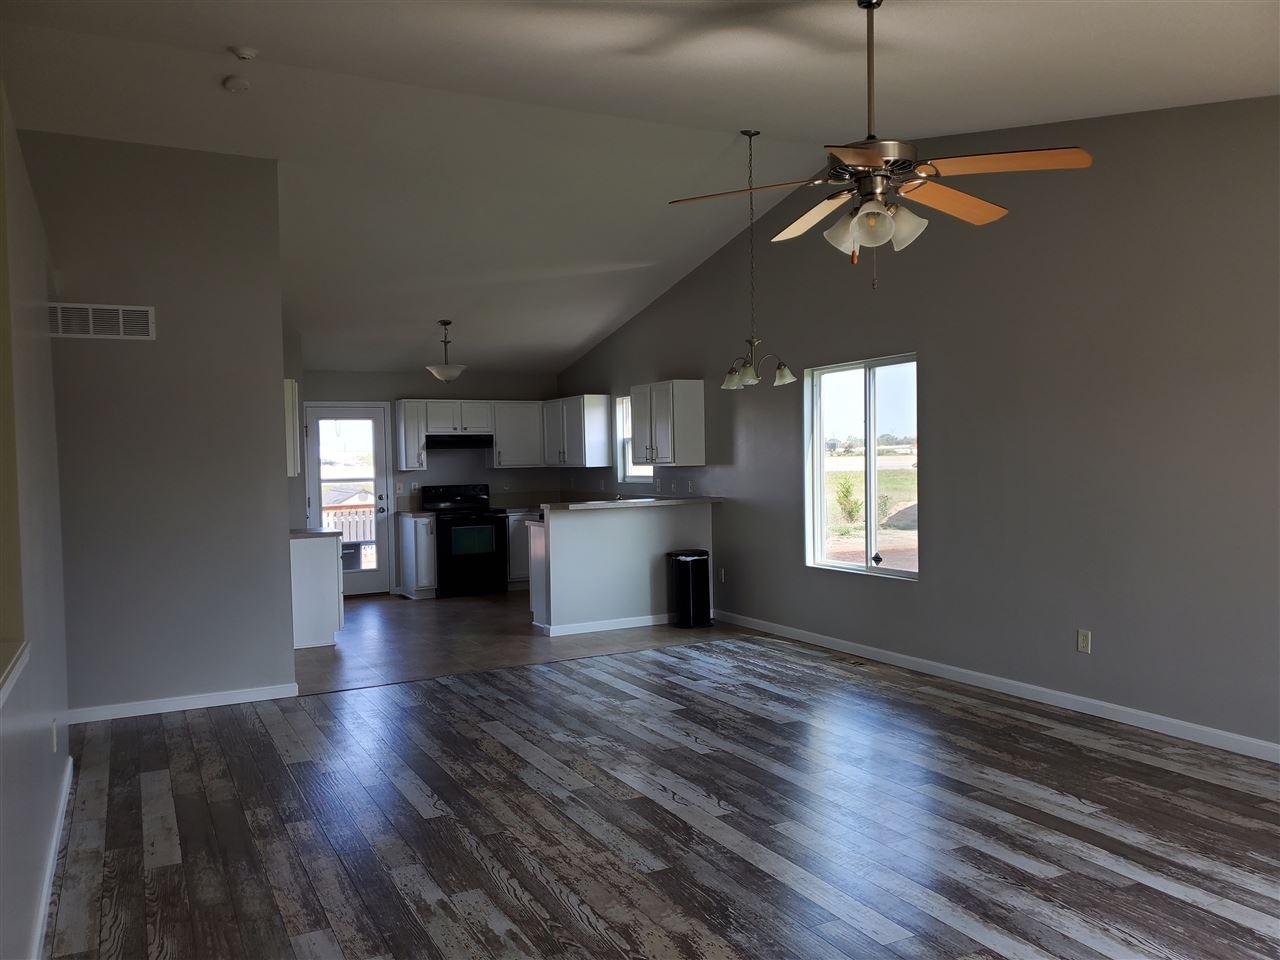 For Sale: 10518 Fawn Grove St, Wichita, KS, 67207,